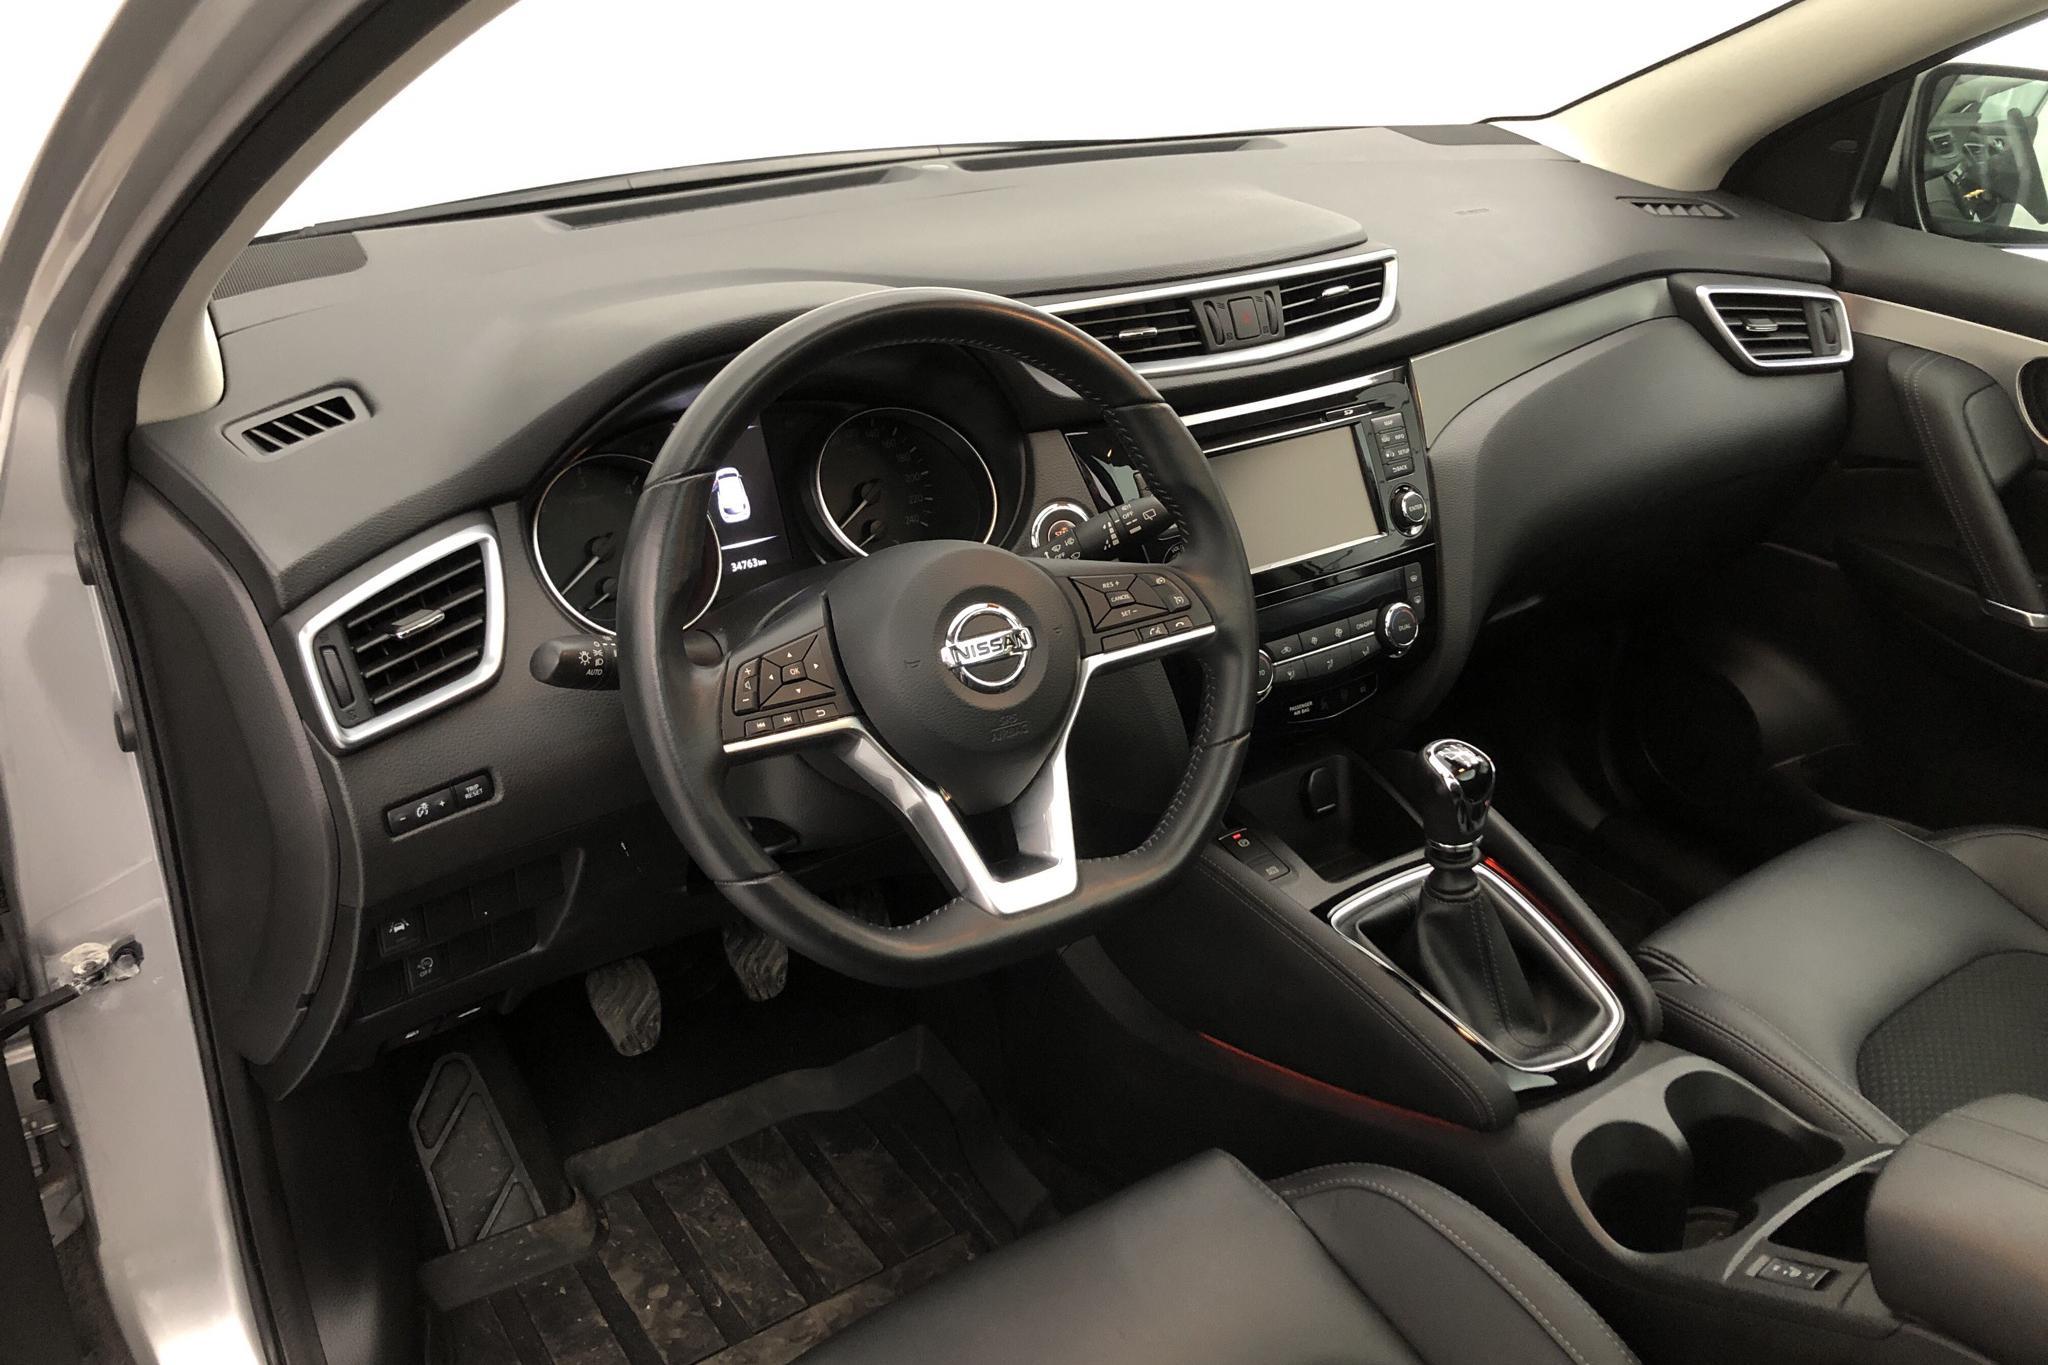 Nissan Qashqai 1.5 dCi (110hk) - 3 476 mil - Manuell - silver - 2018